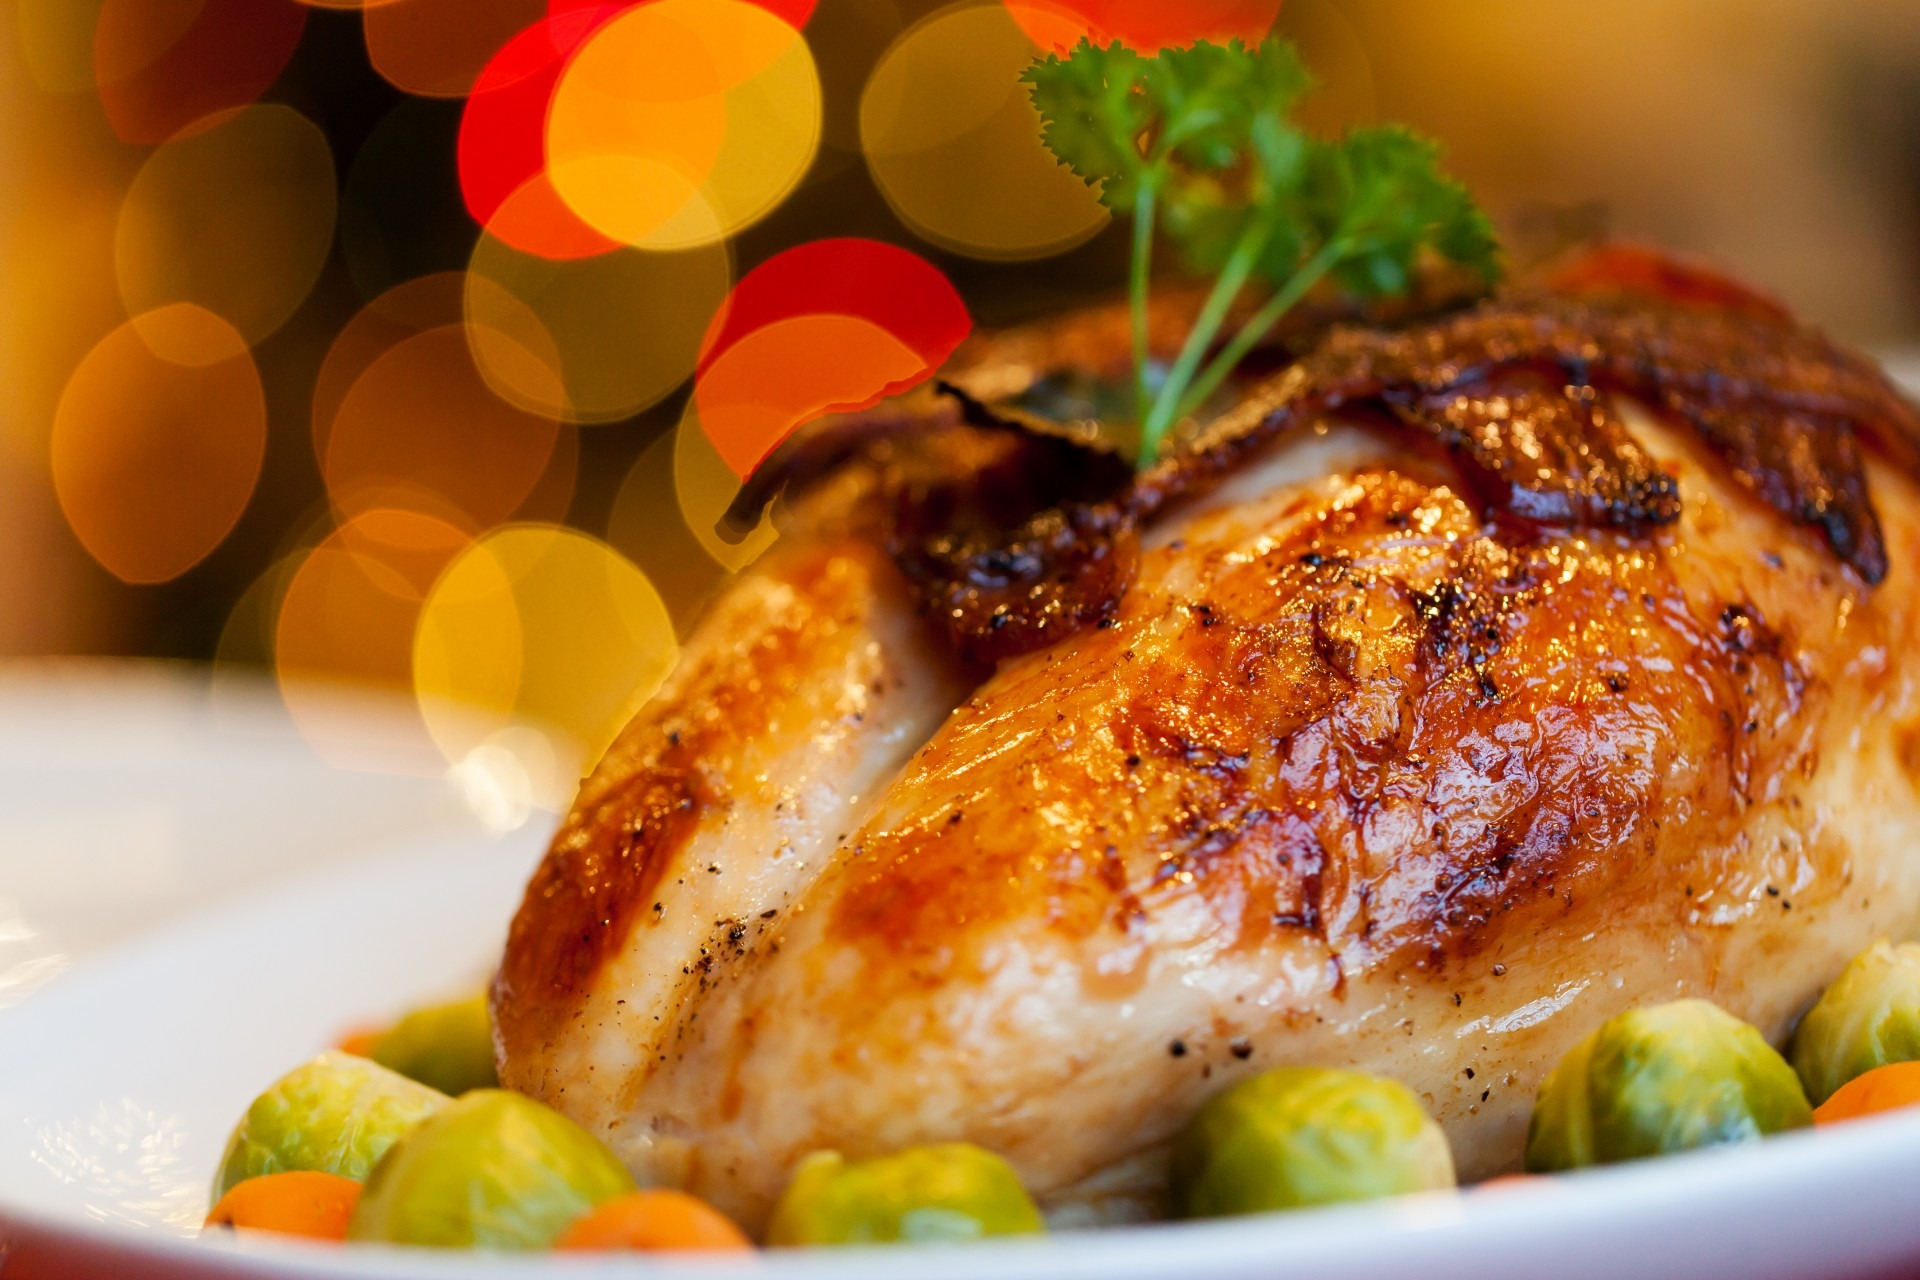 Hocking College Faculty | Thanksgiving Preparation <br>Chef Katie McGushin